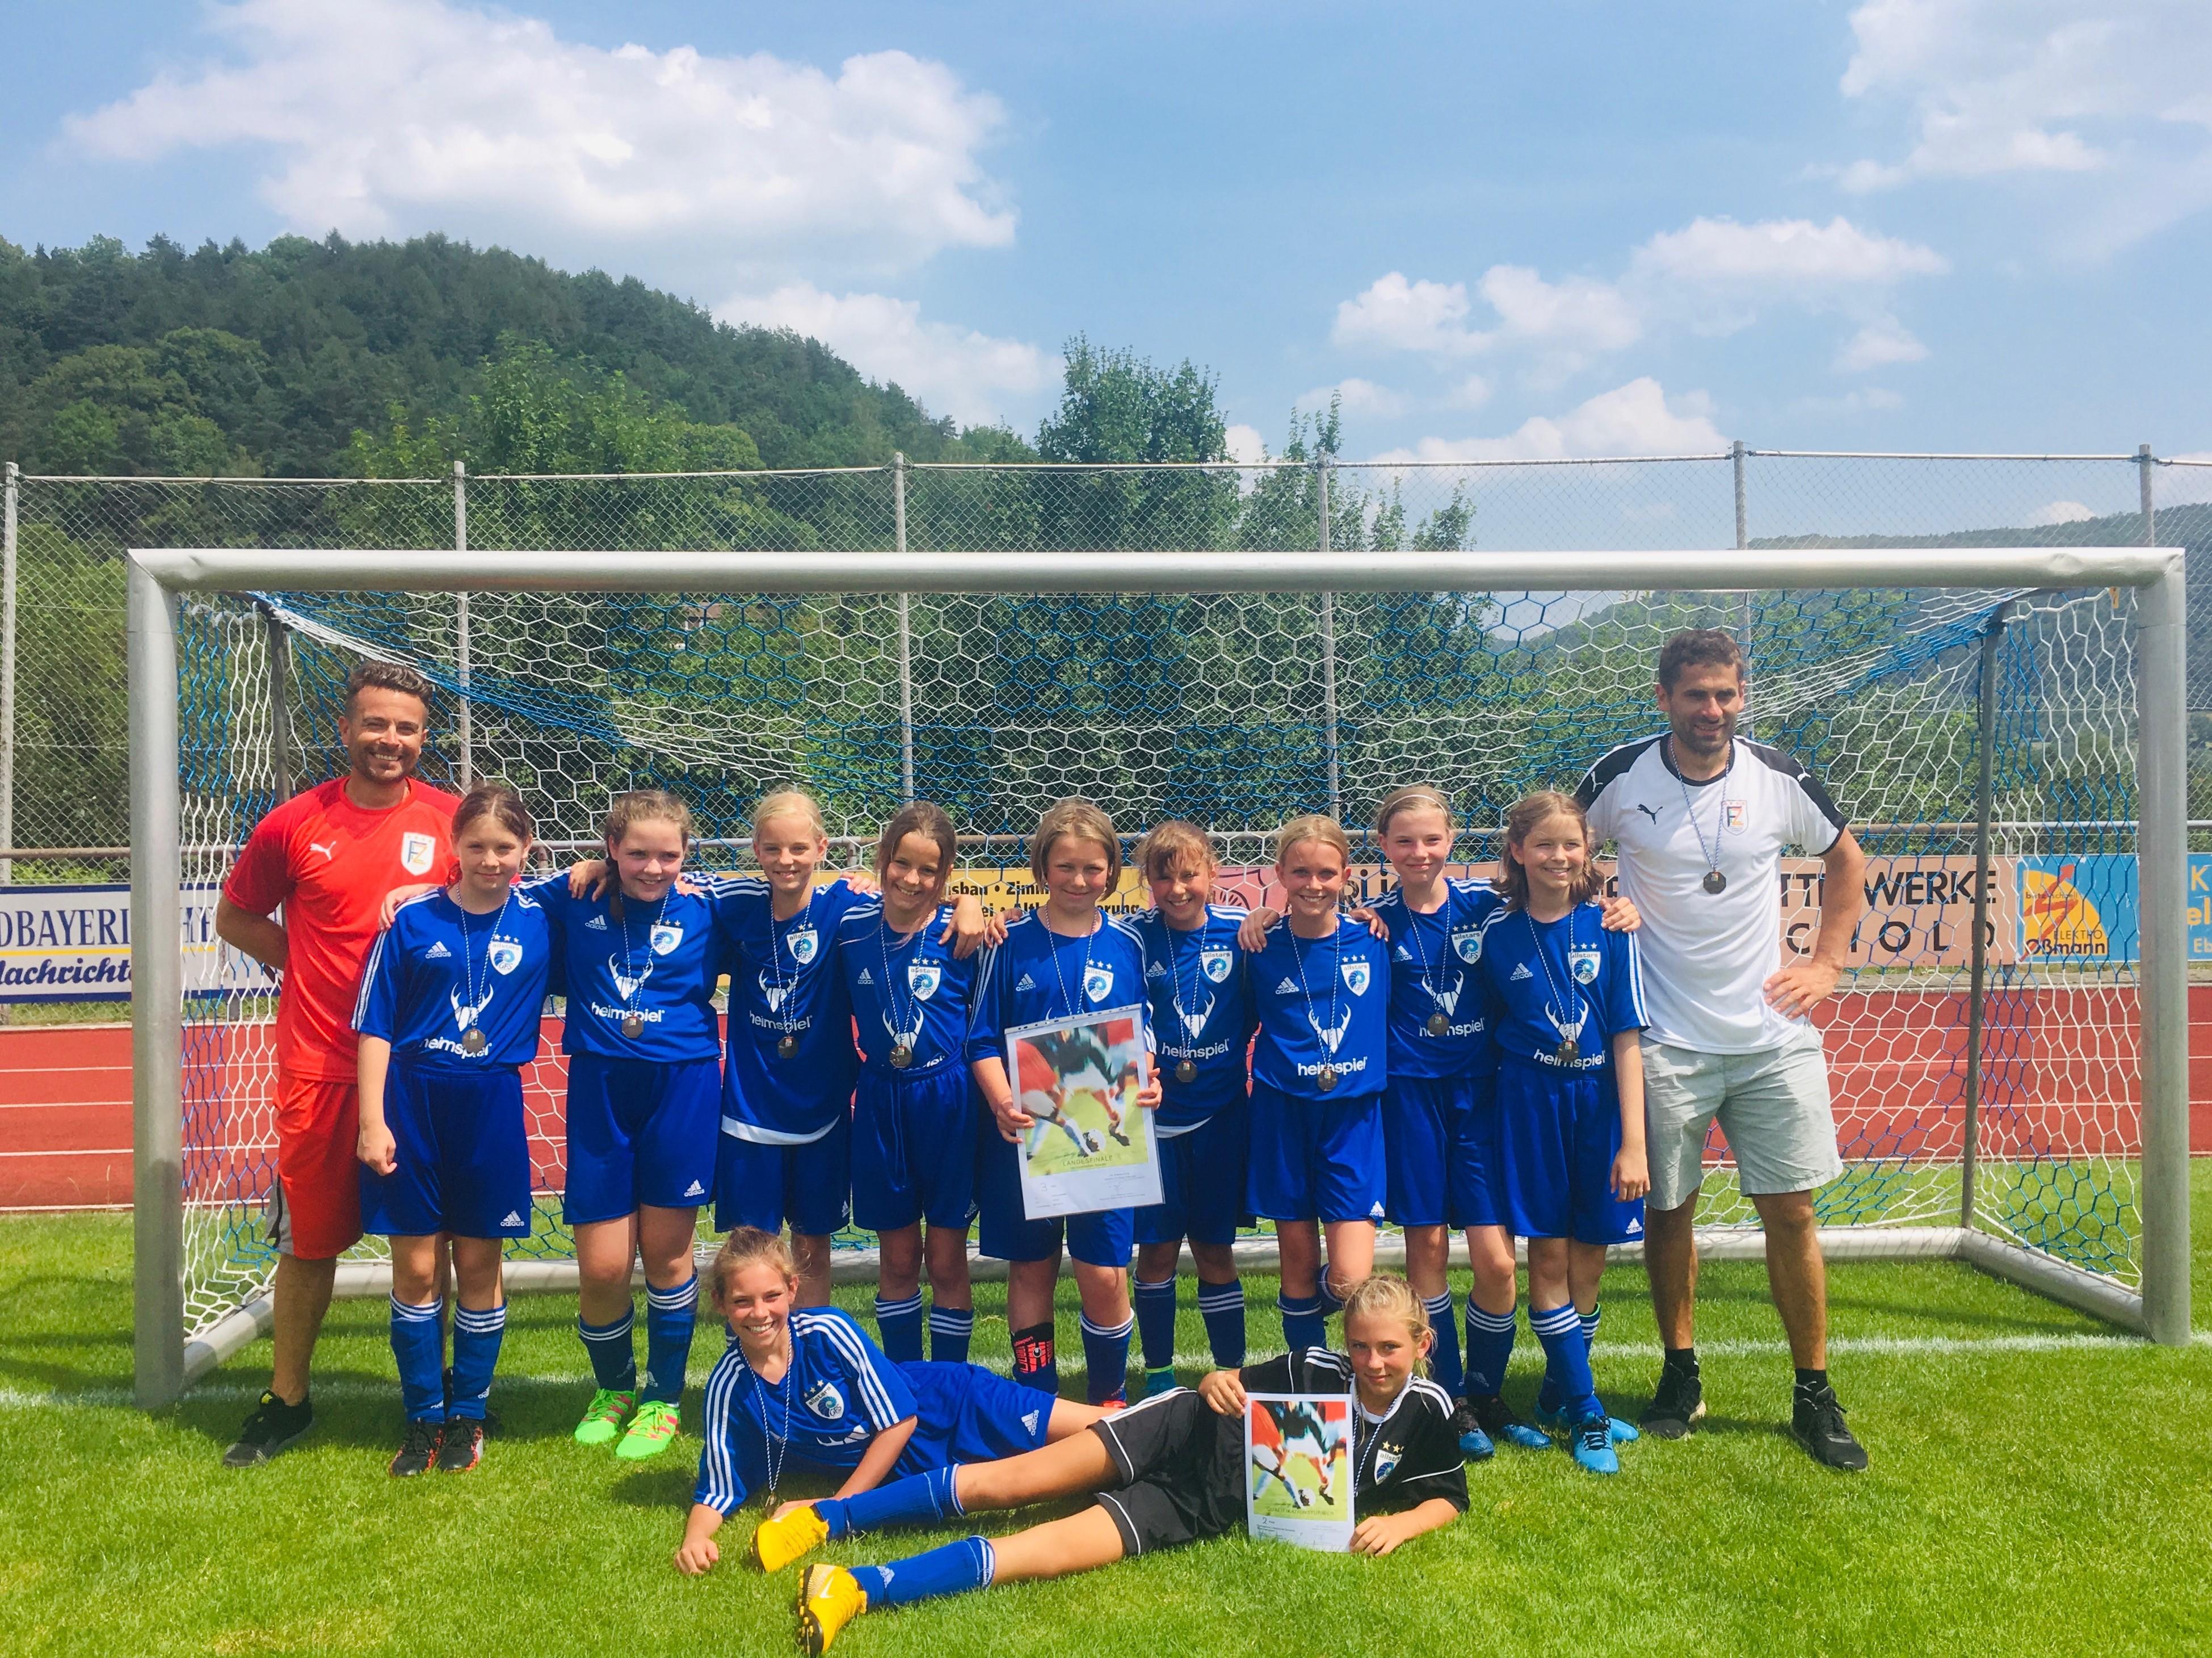 Mädchen IV holen dritten Platz bei Bayerischen Schulmeisterschaften